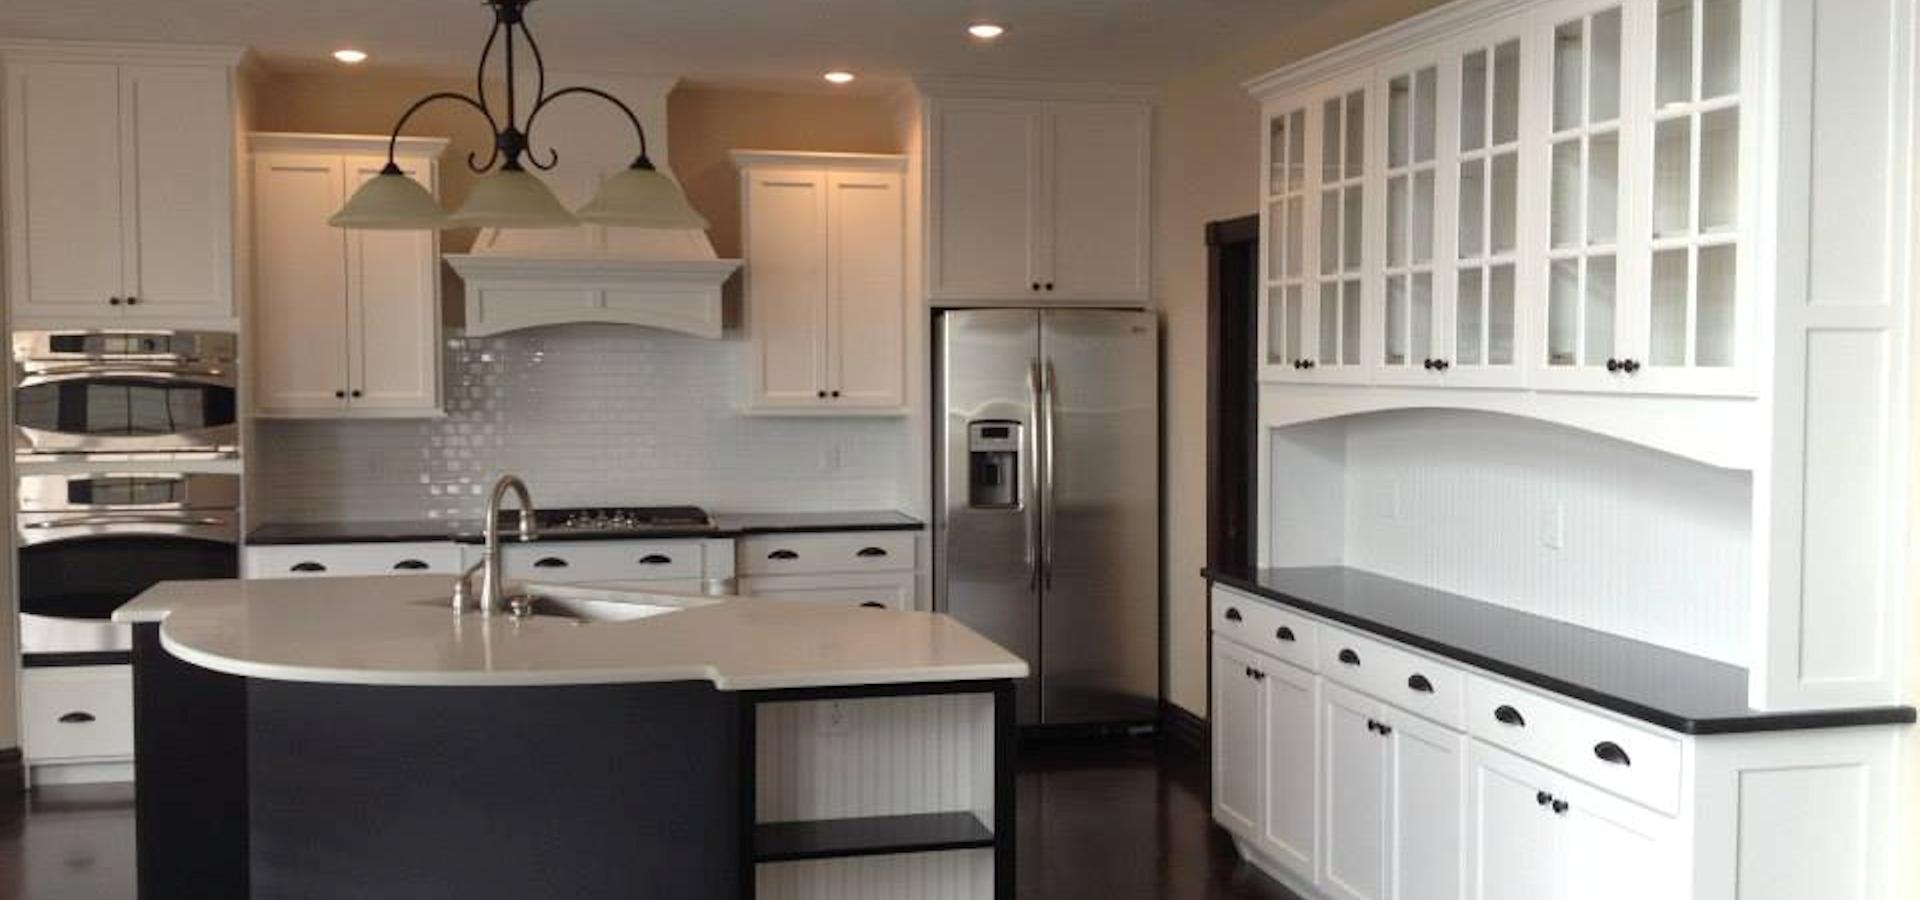 Custom Cabinets And Countertops Topeka Lawrence Manhattan Kansas City Ball Custom Kitchens